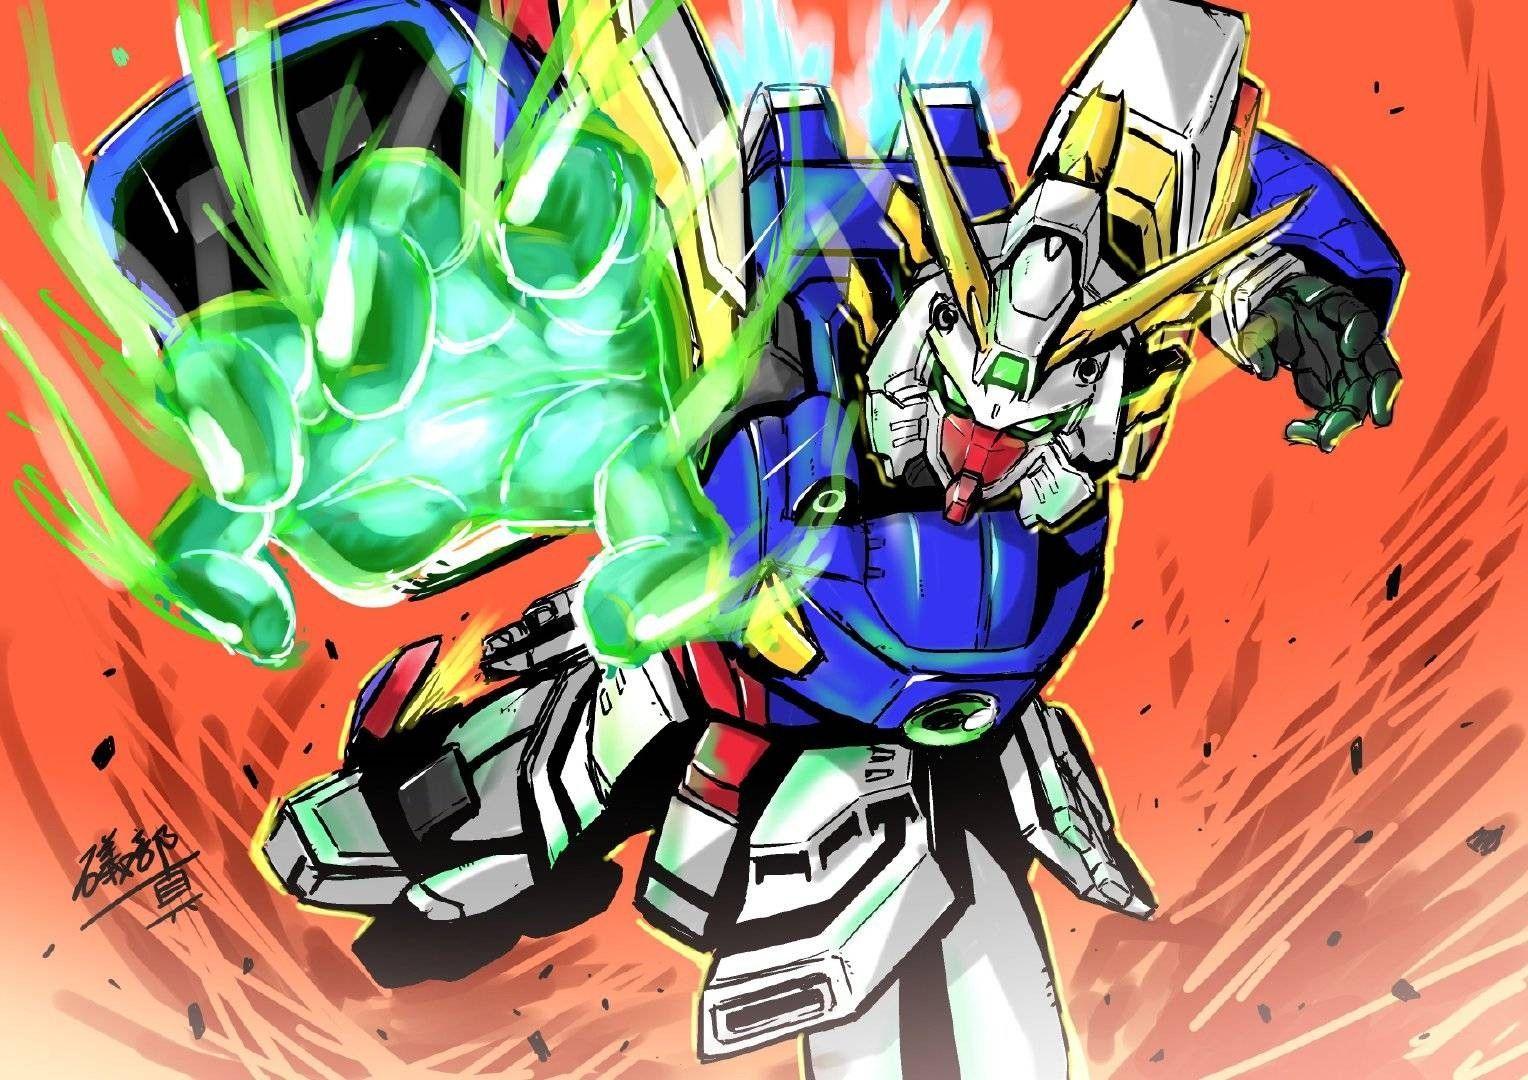 Pin By Michael Mccown On Gundam Gundam Wallpapers Mobile Fighter G Gundam Gundam Art